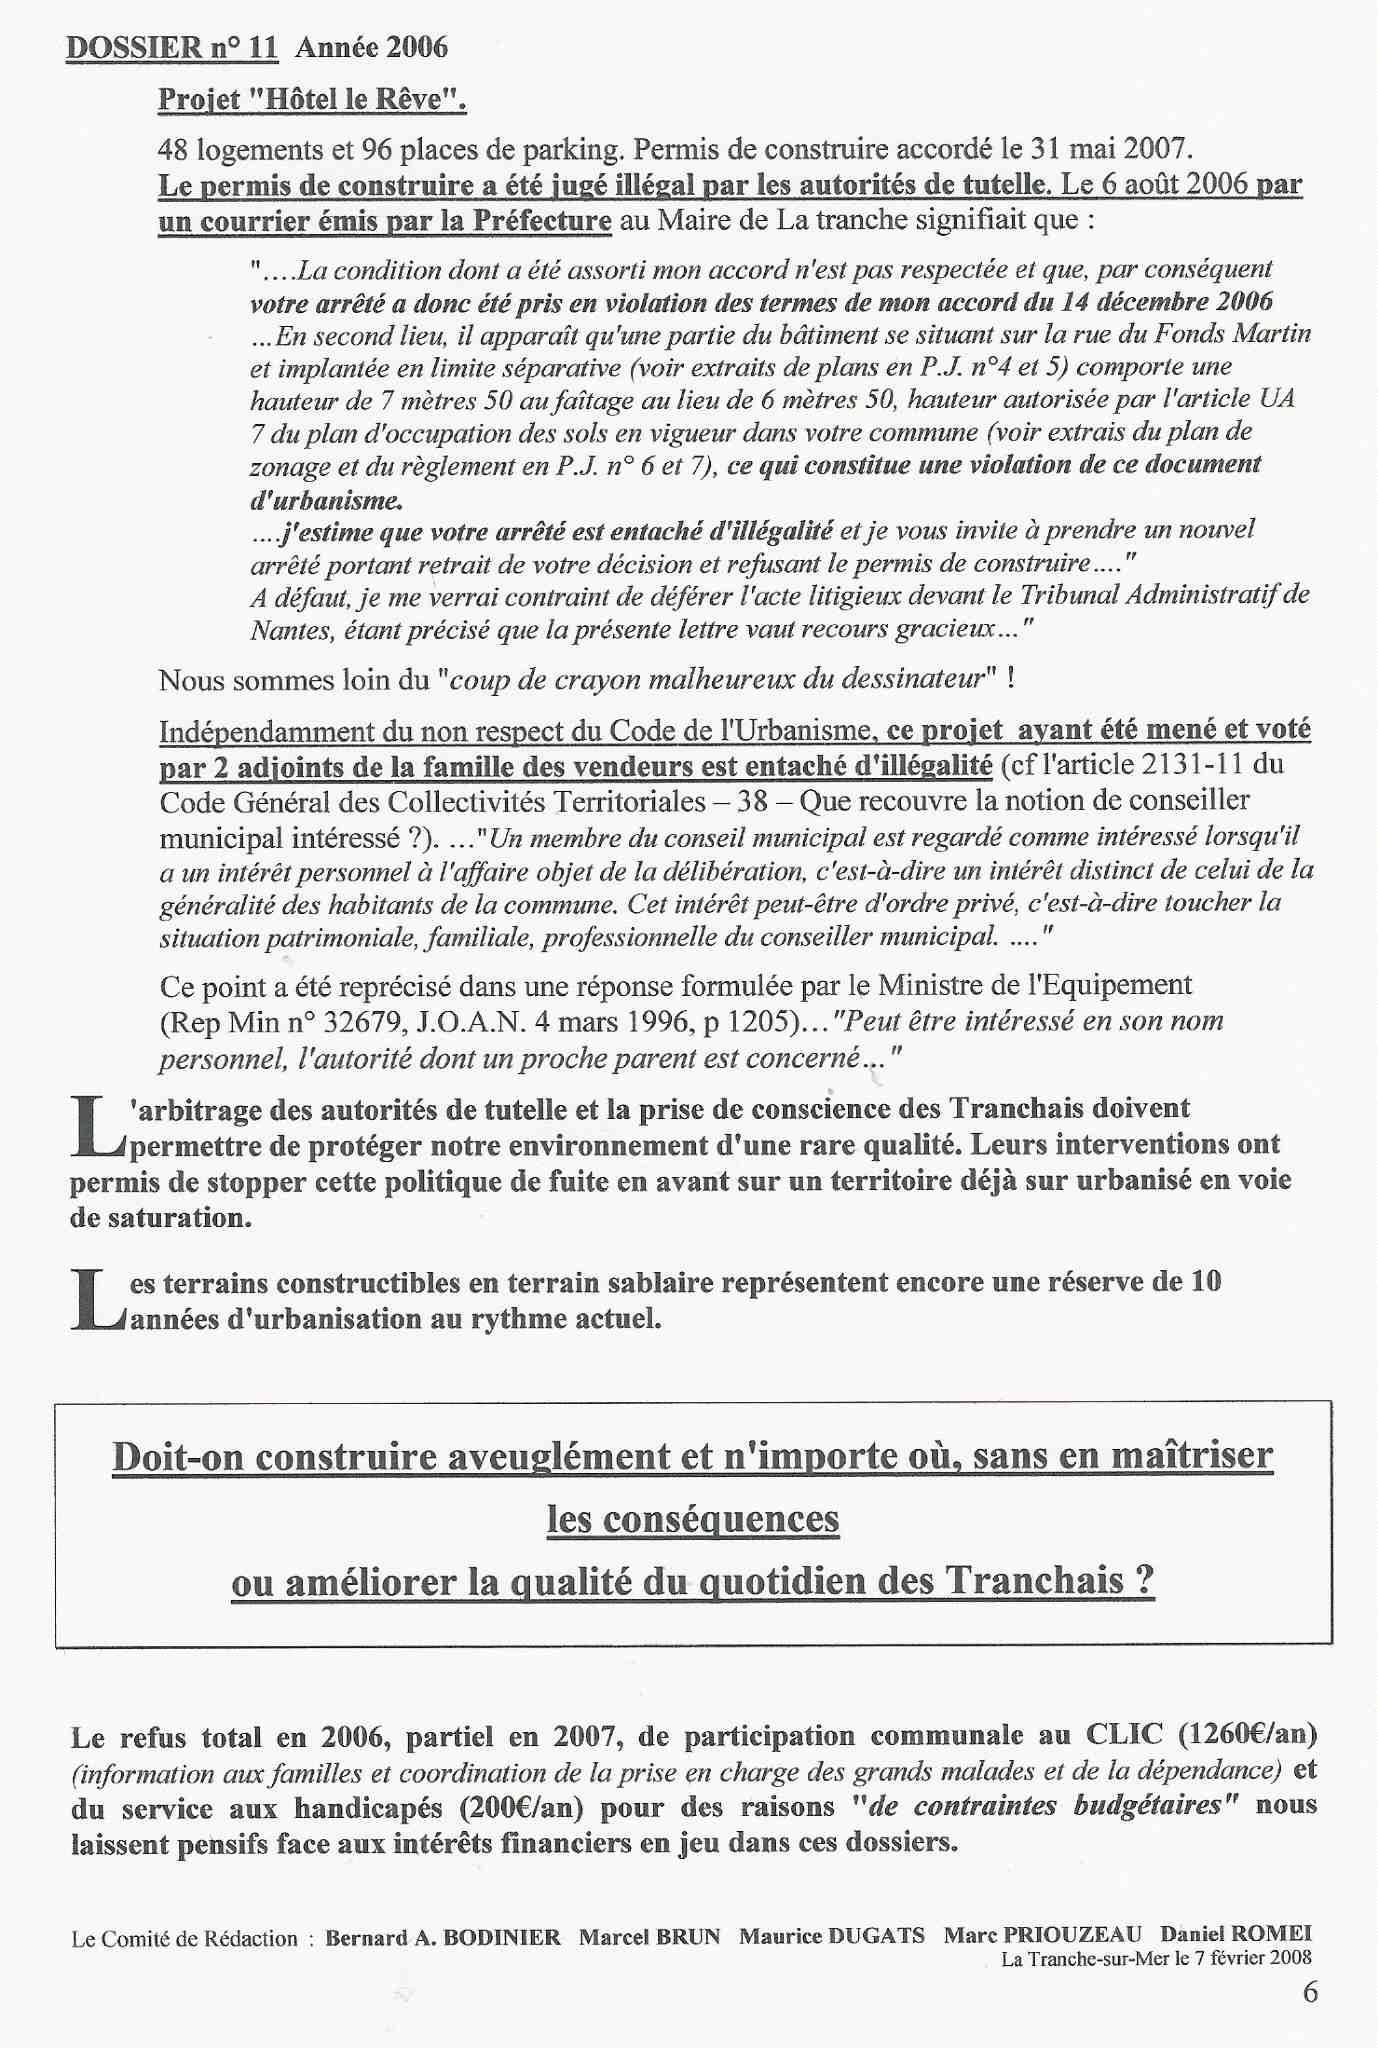 Page 6 JPEG 6.jpg